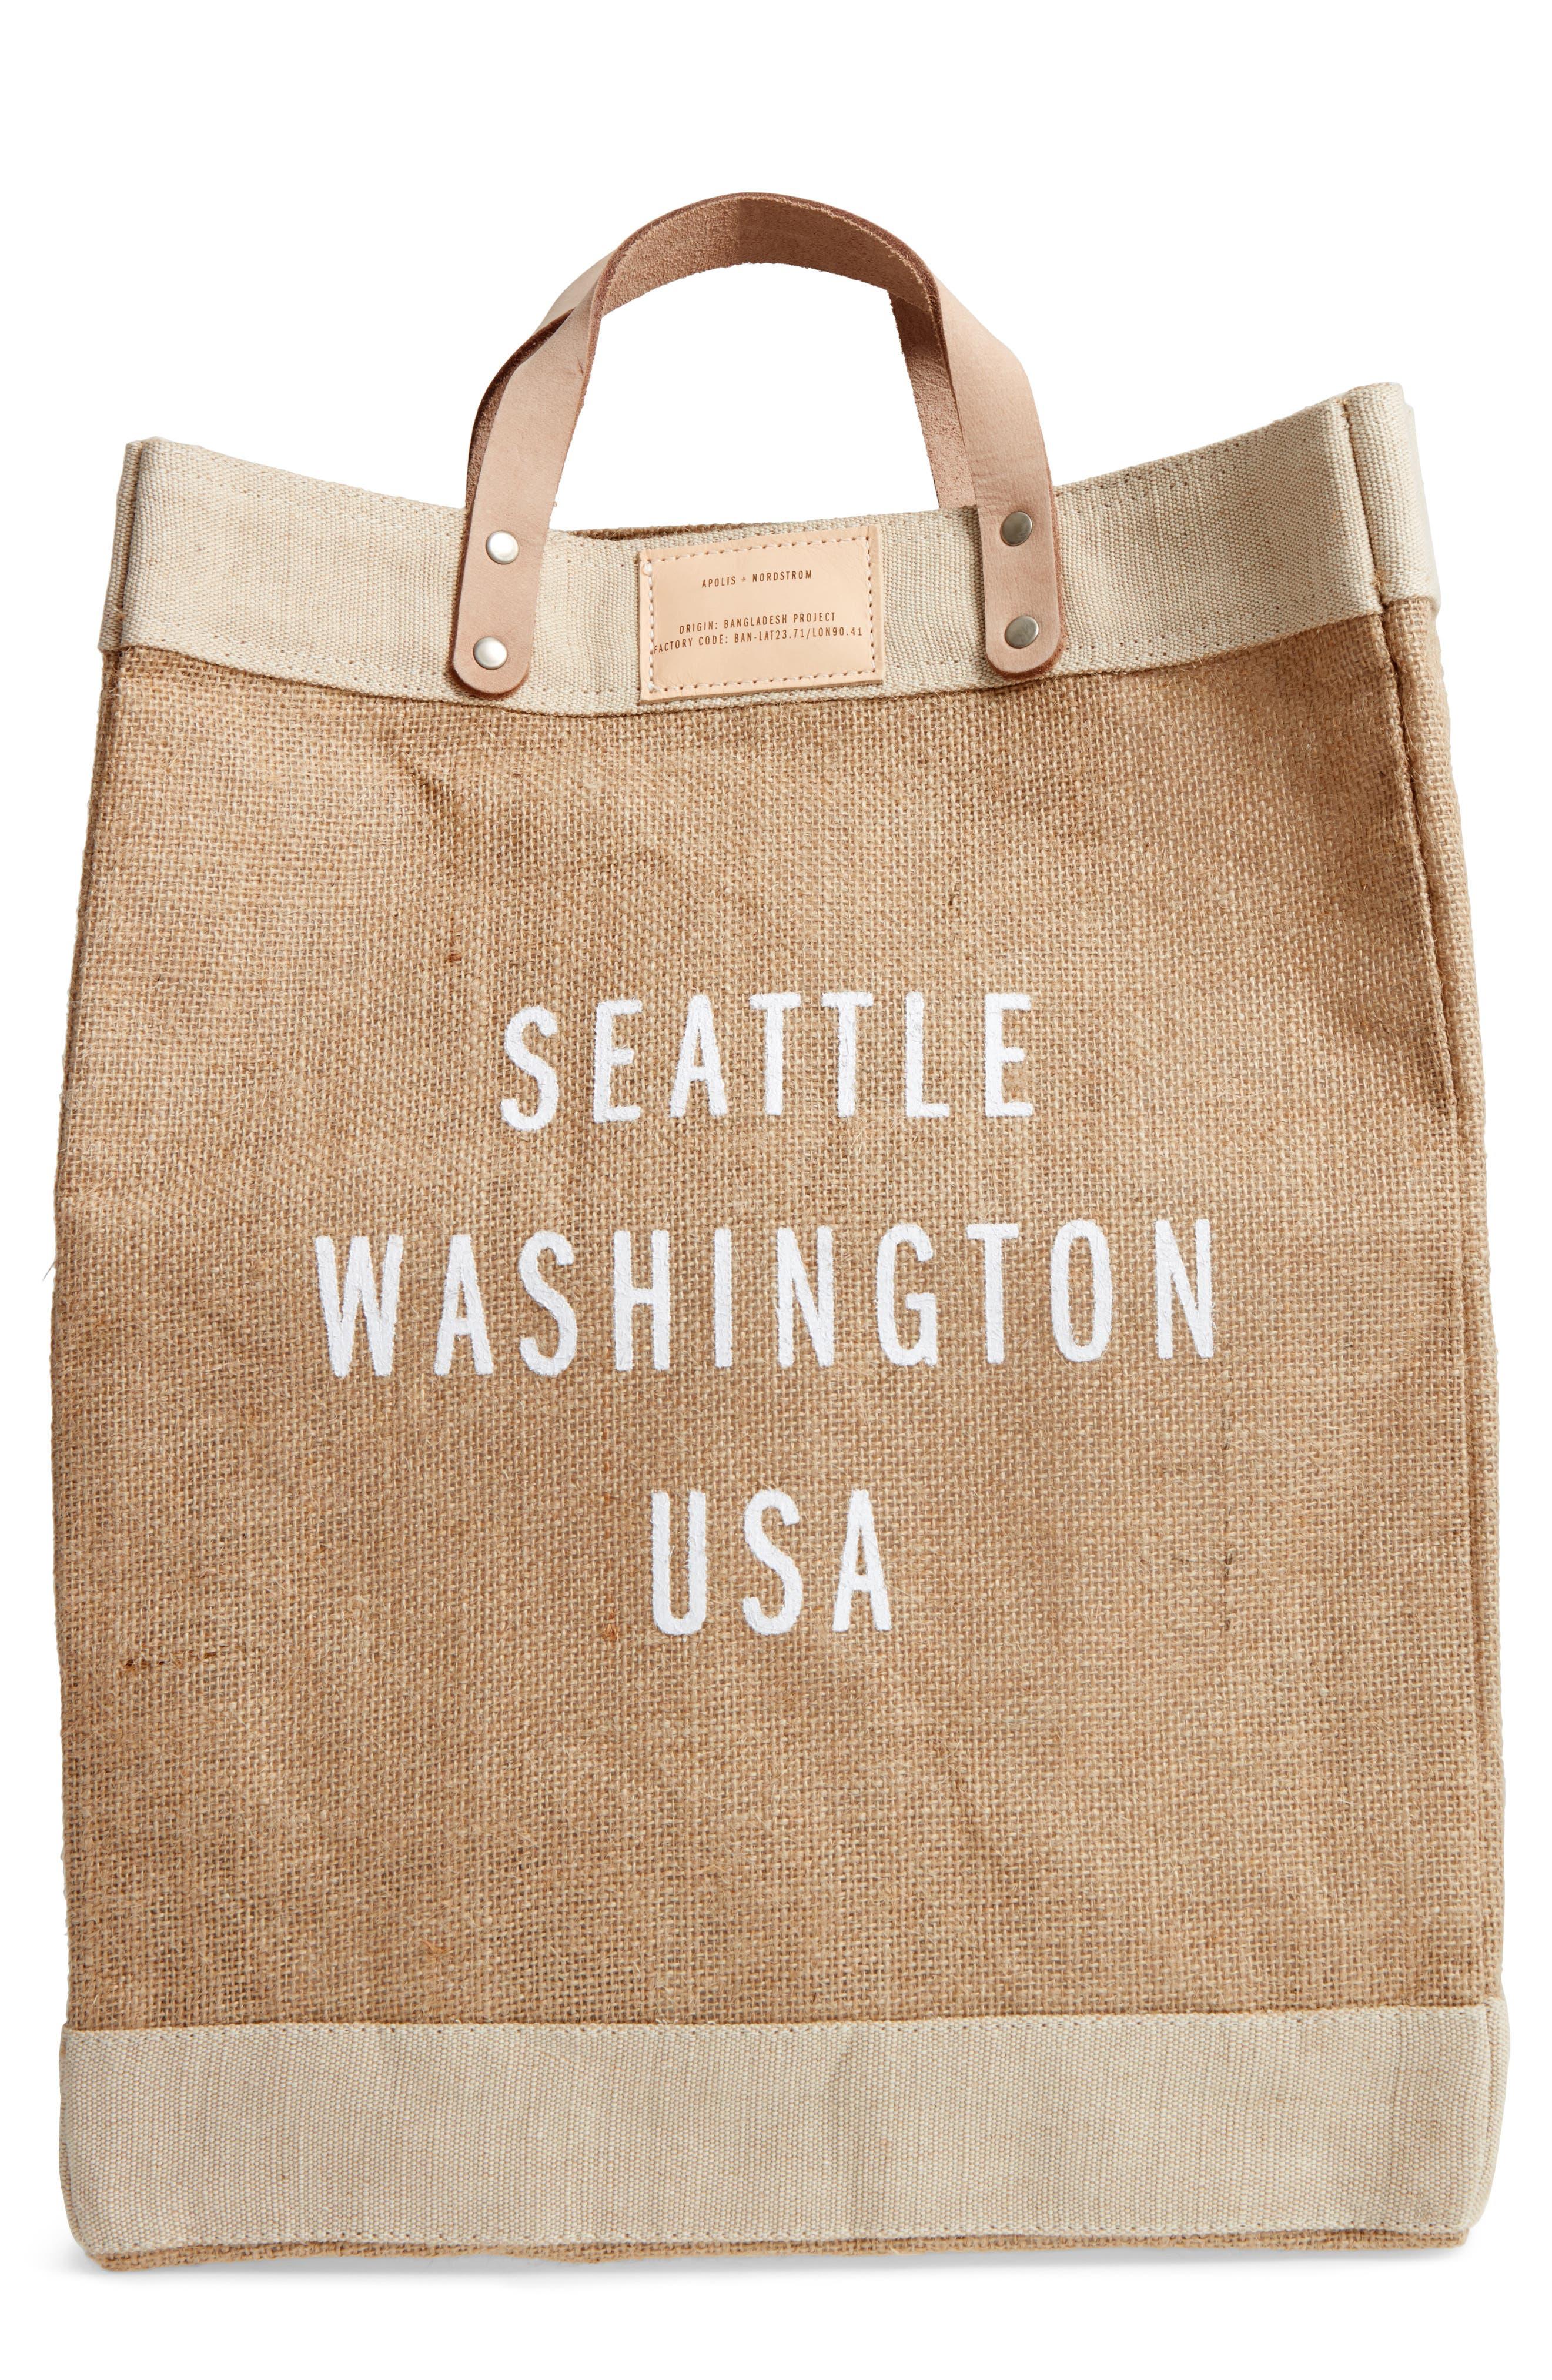 Alternate Image 1 Selected - Apolis Market Bag